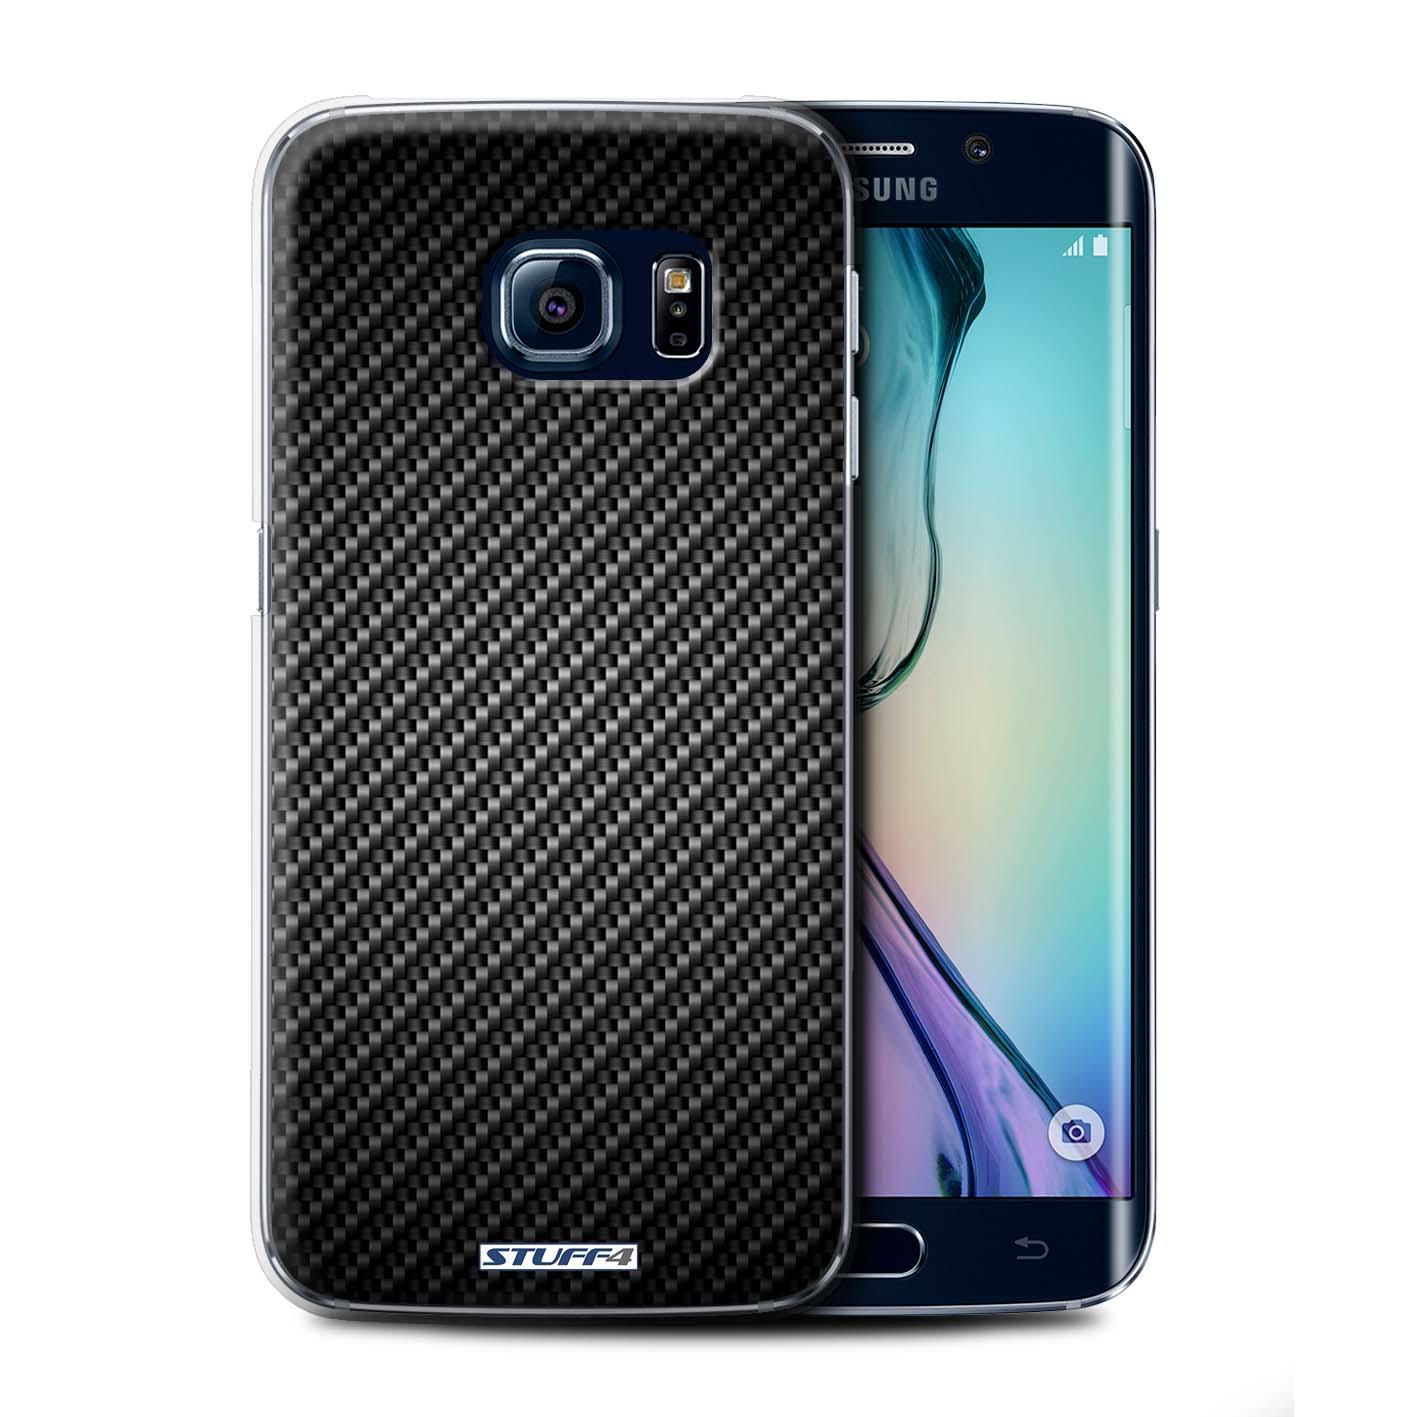 Coque-Etui-de-Stuff4-pour-Samsung-Galaxy-S6-Edge-Motif-de-Fibre-de-Carbone